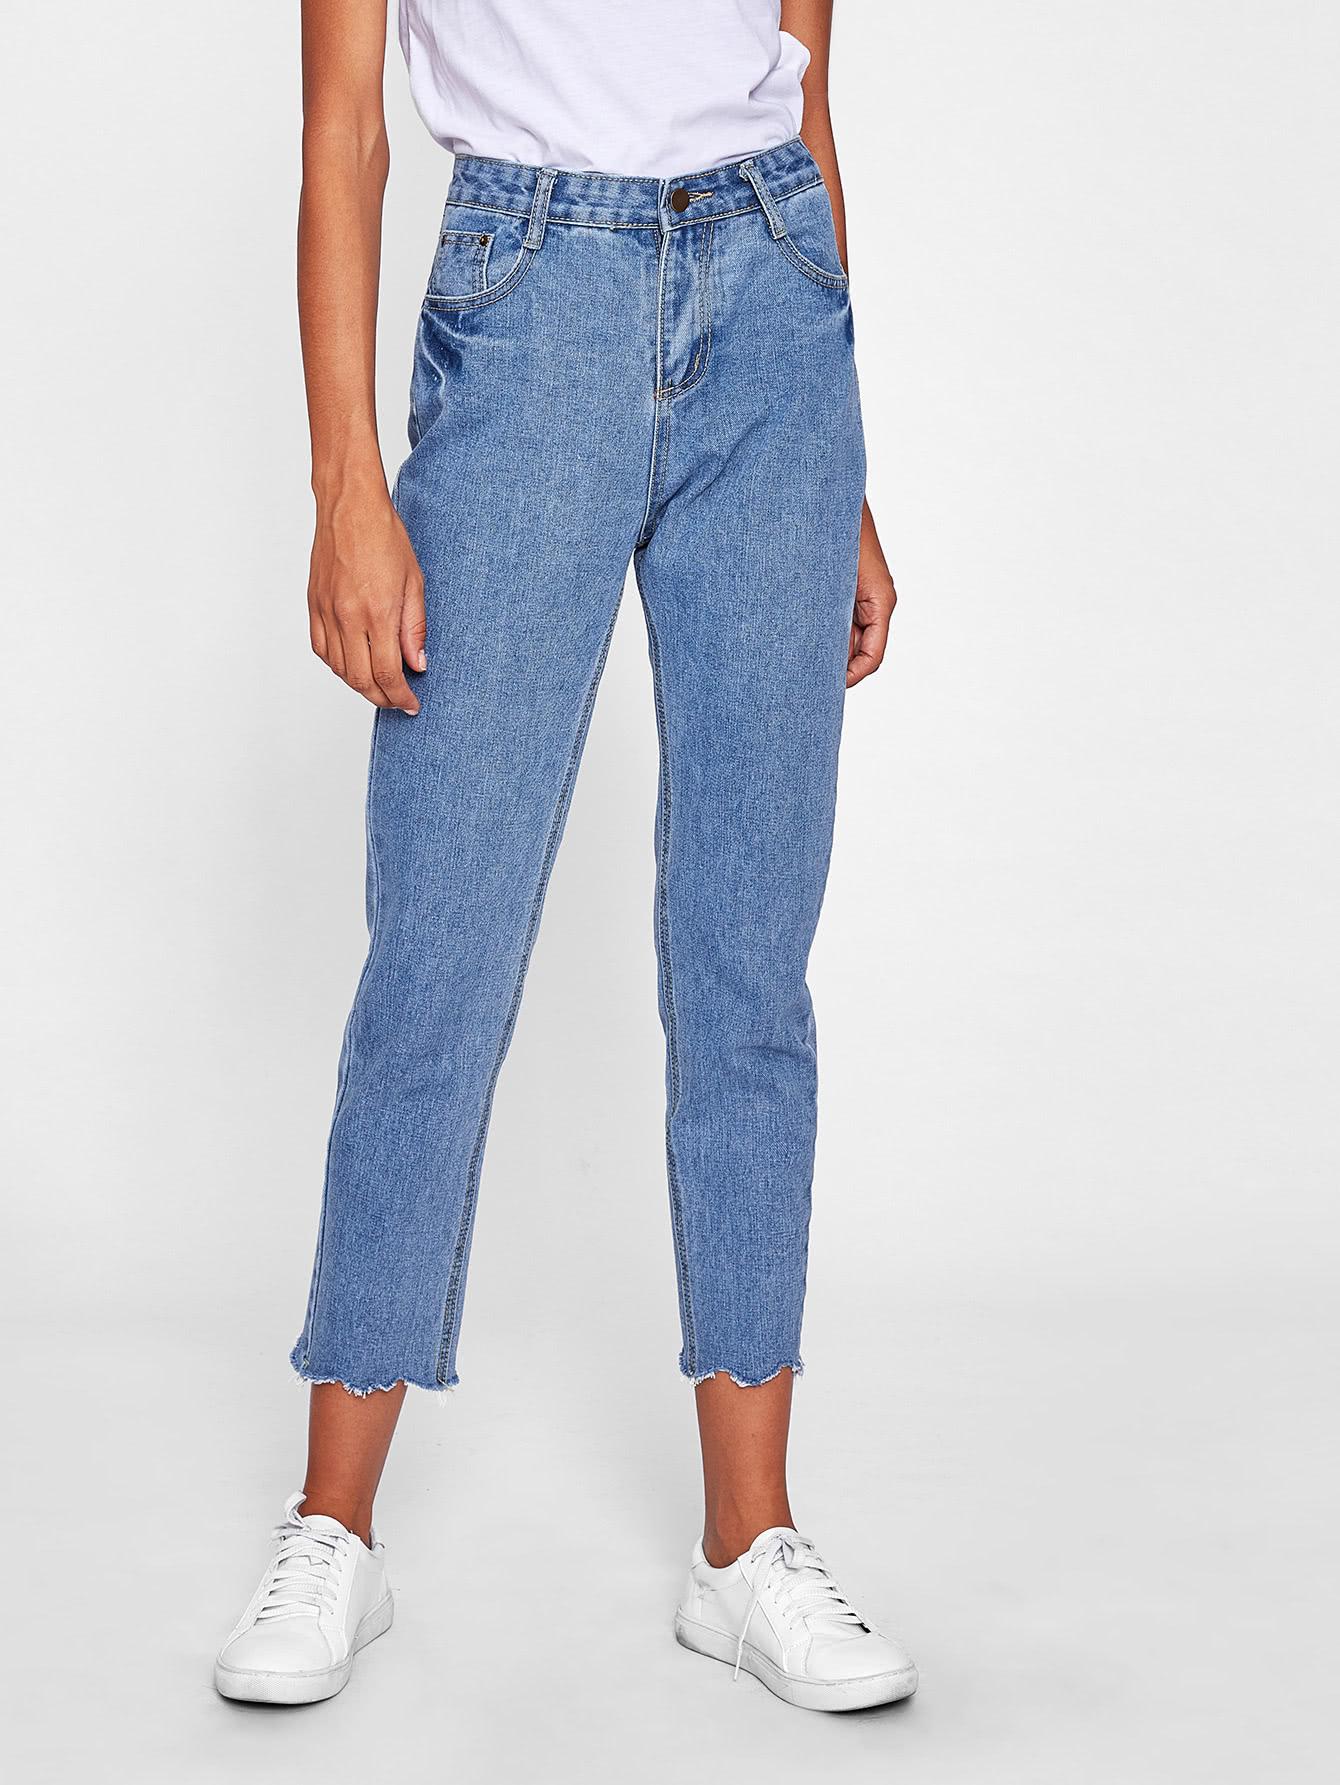 Ripped Hem Skinny Jeans ripped skinny leggings